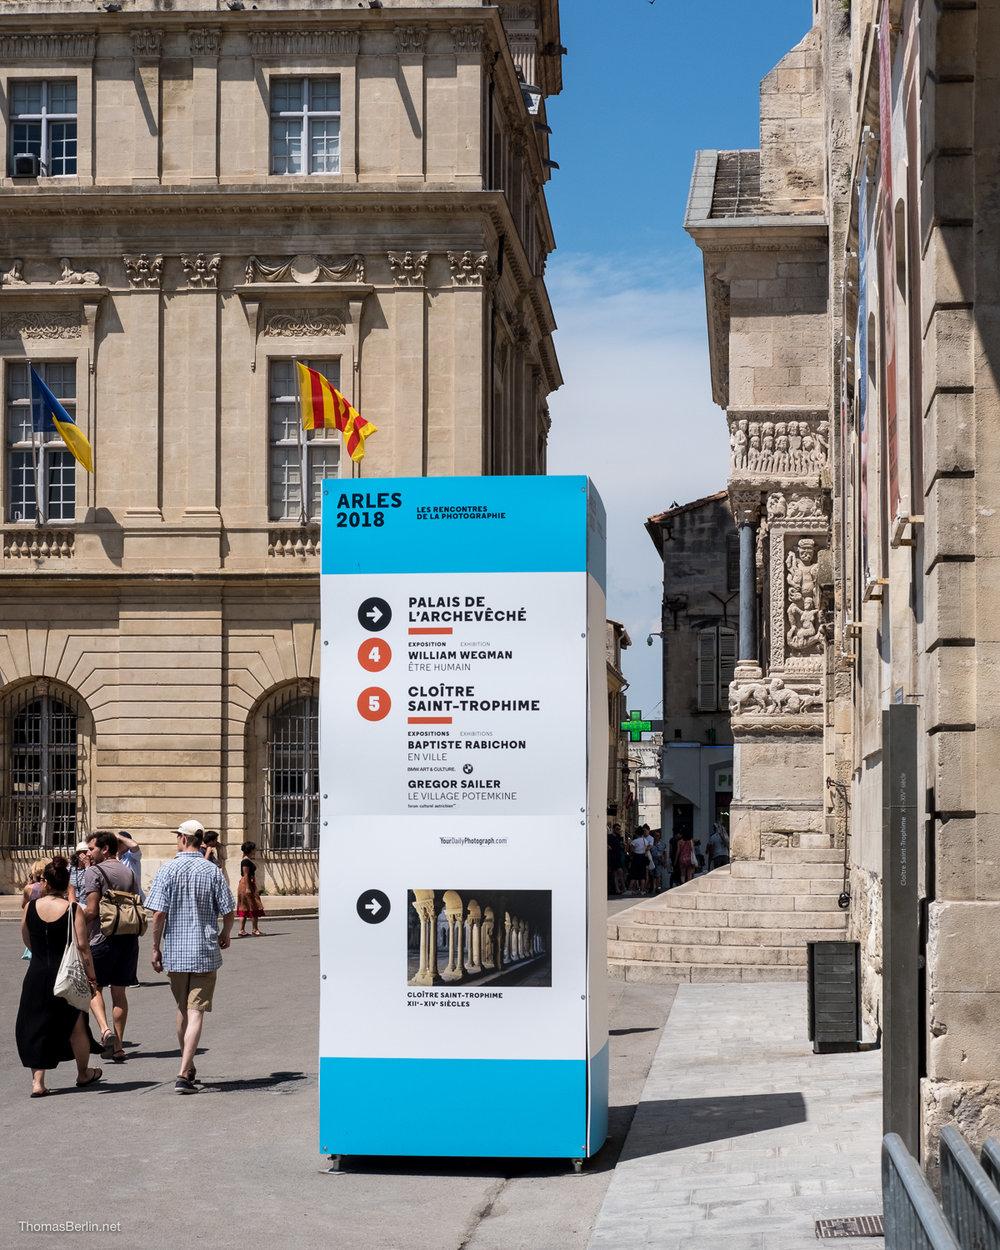 Thomas Berlin Arles 2018-7752.jpg